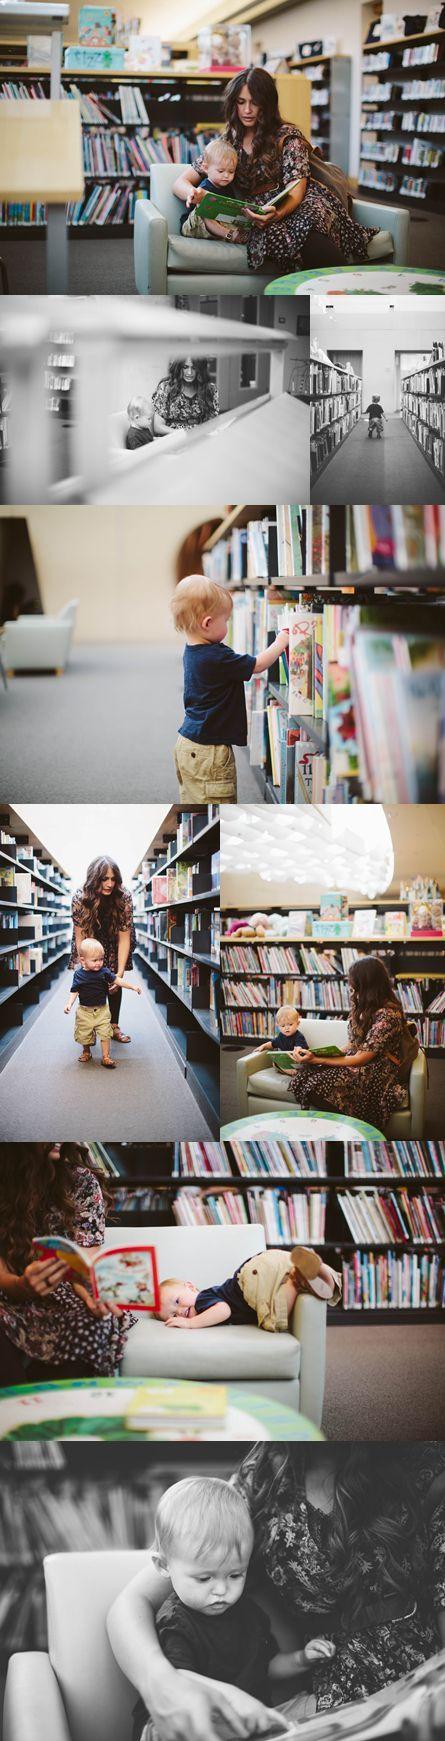 Library Photo Session    Kandice Breinholt Photography                                                                                                                                                                                 More